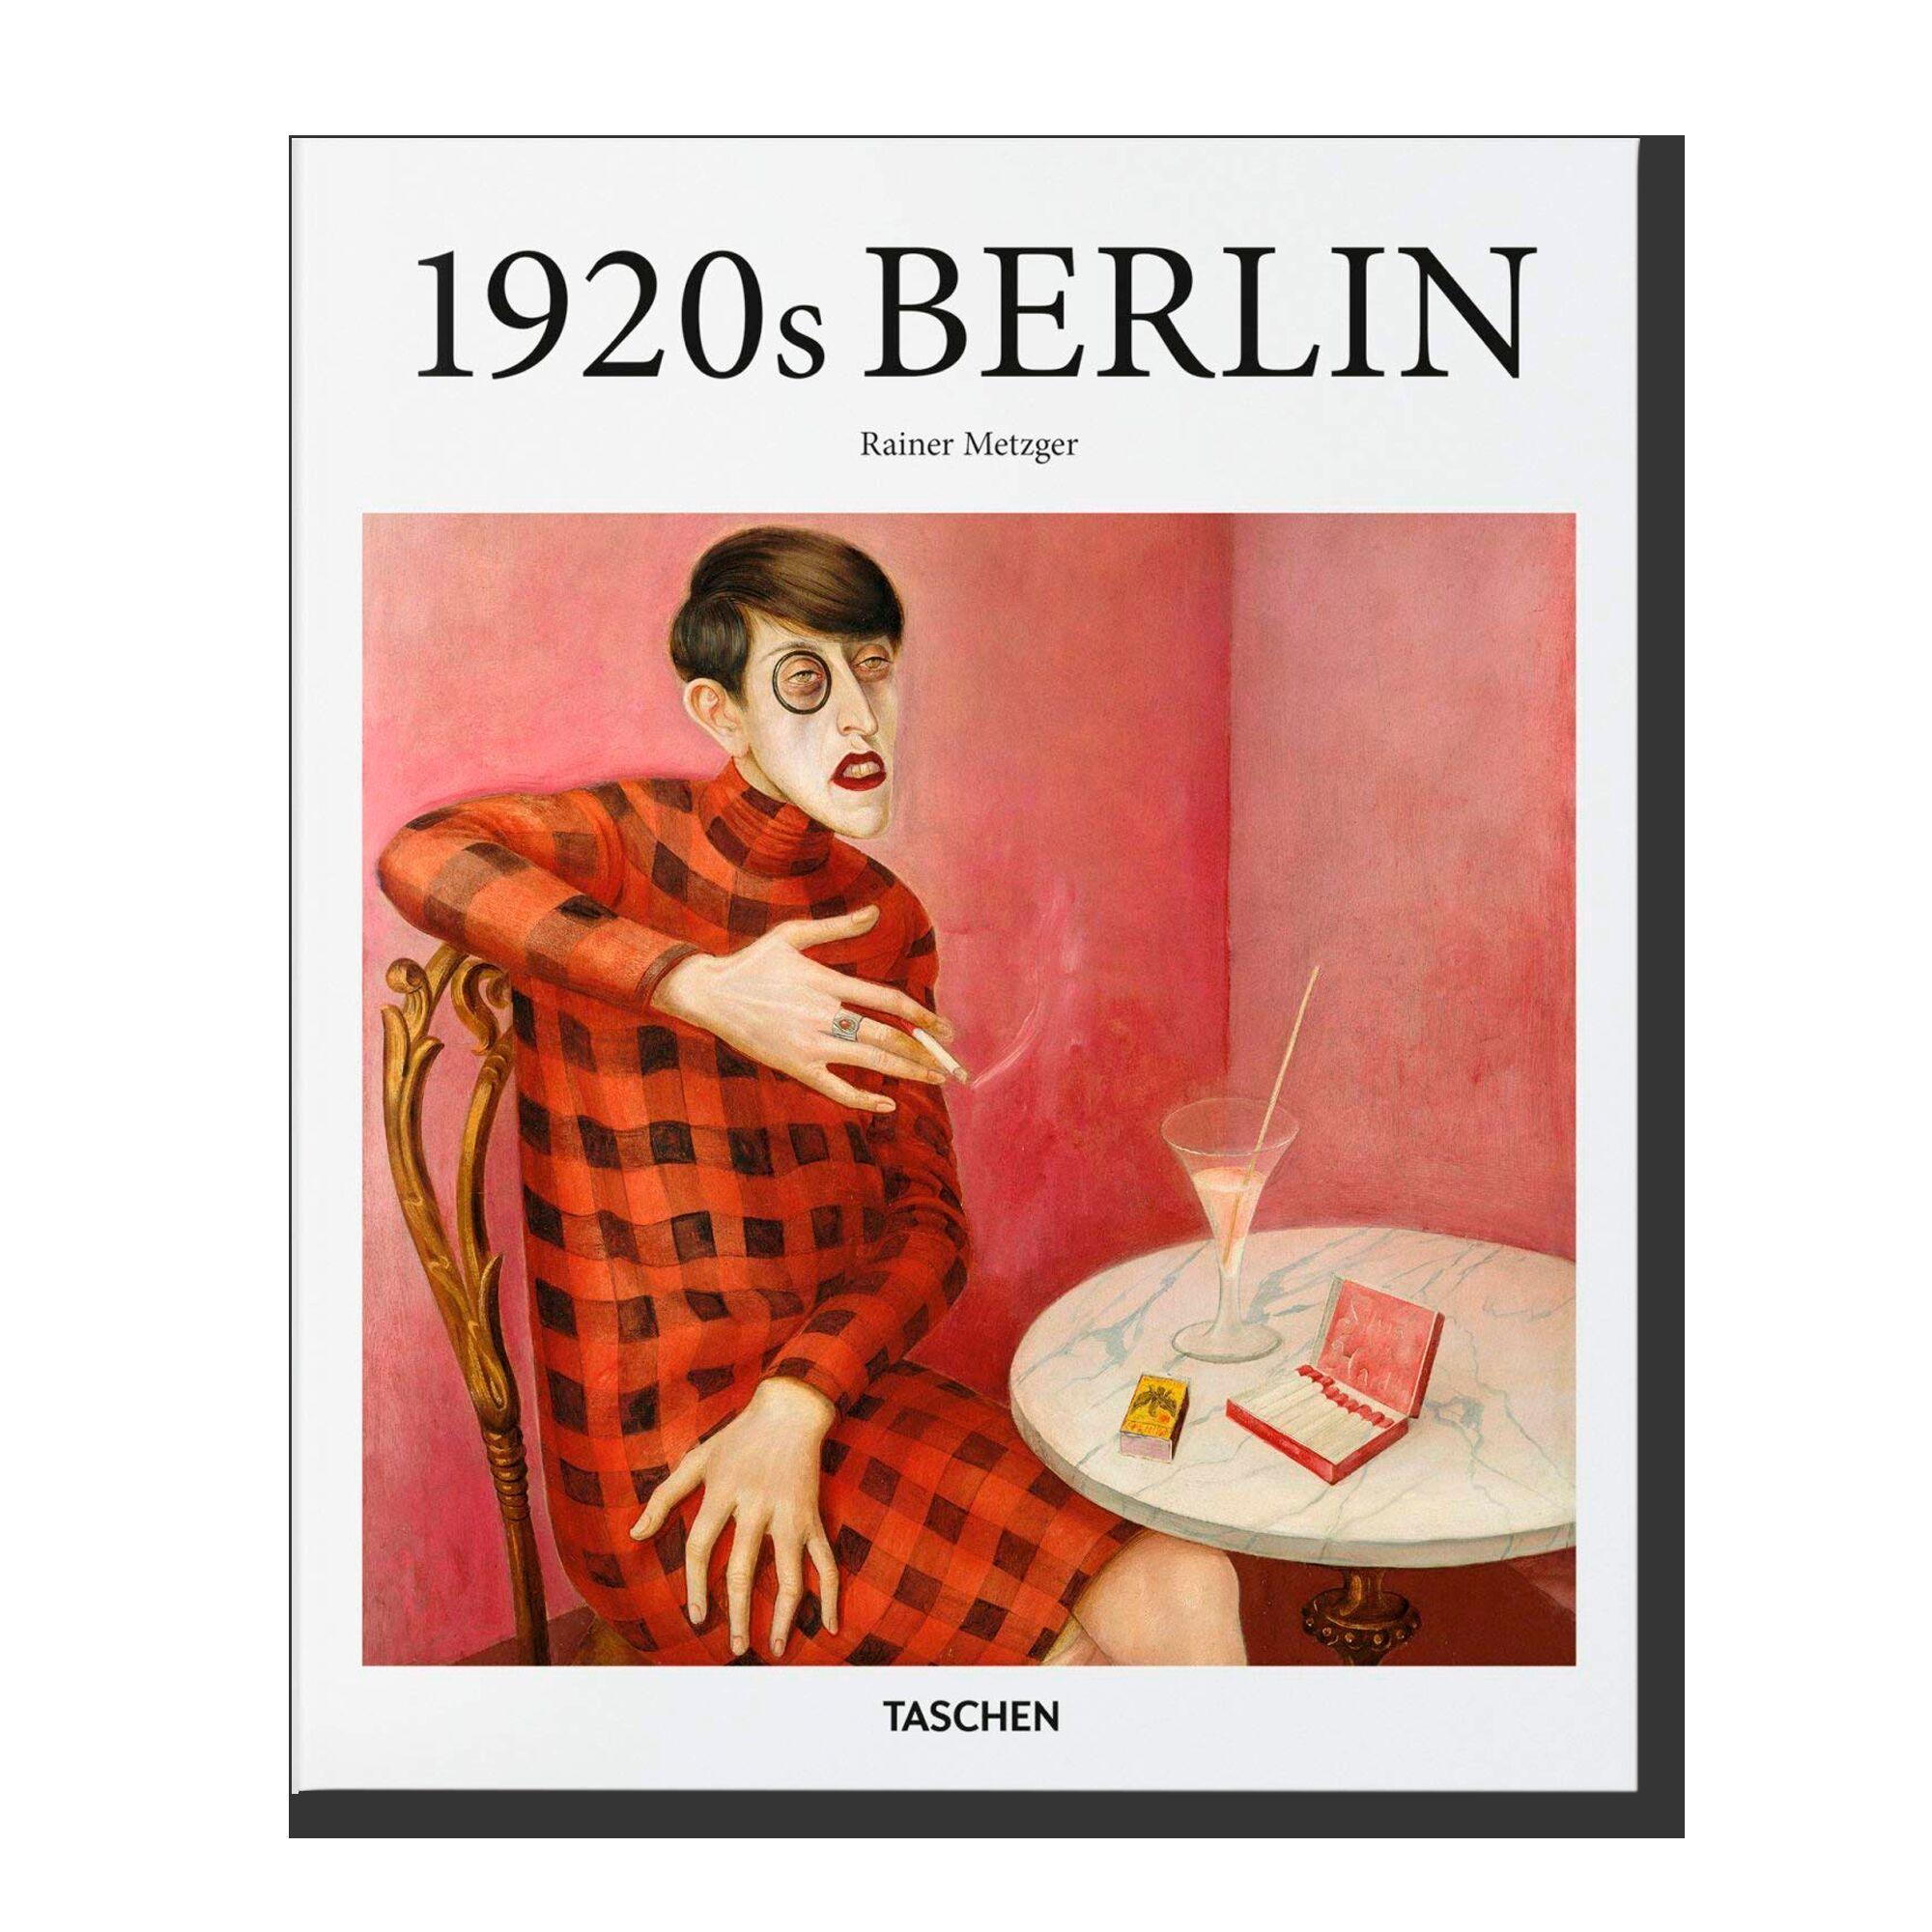 Berlin in the 1920s (Basic Art Series)